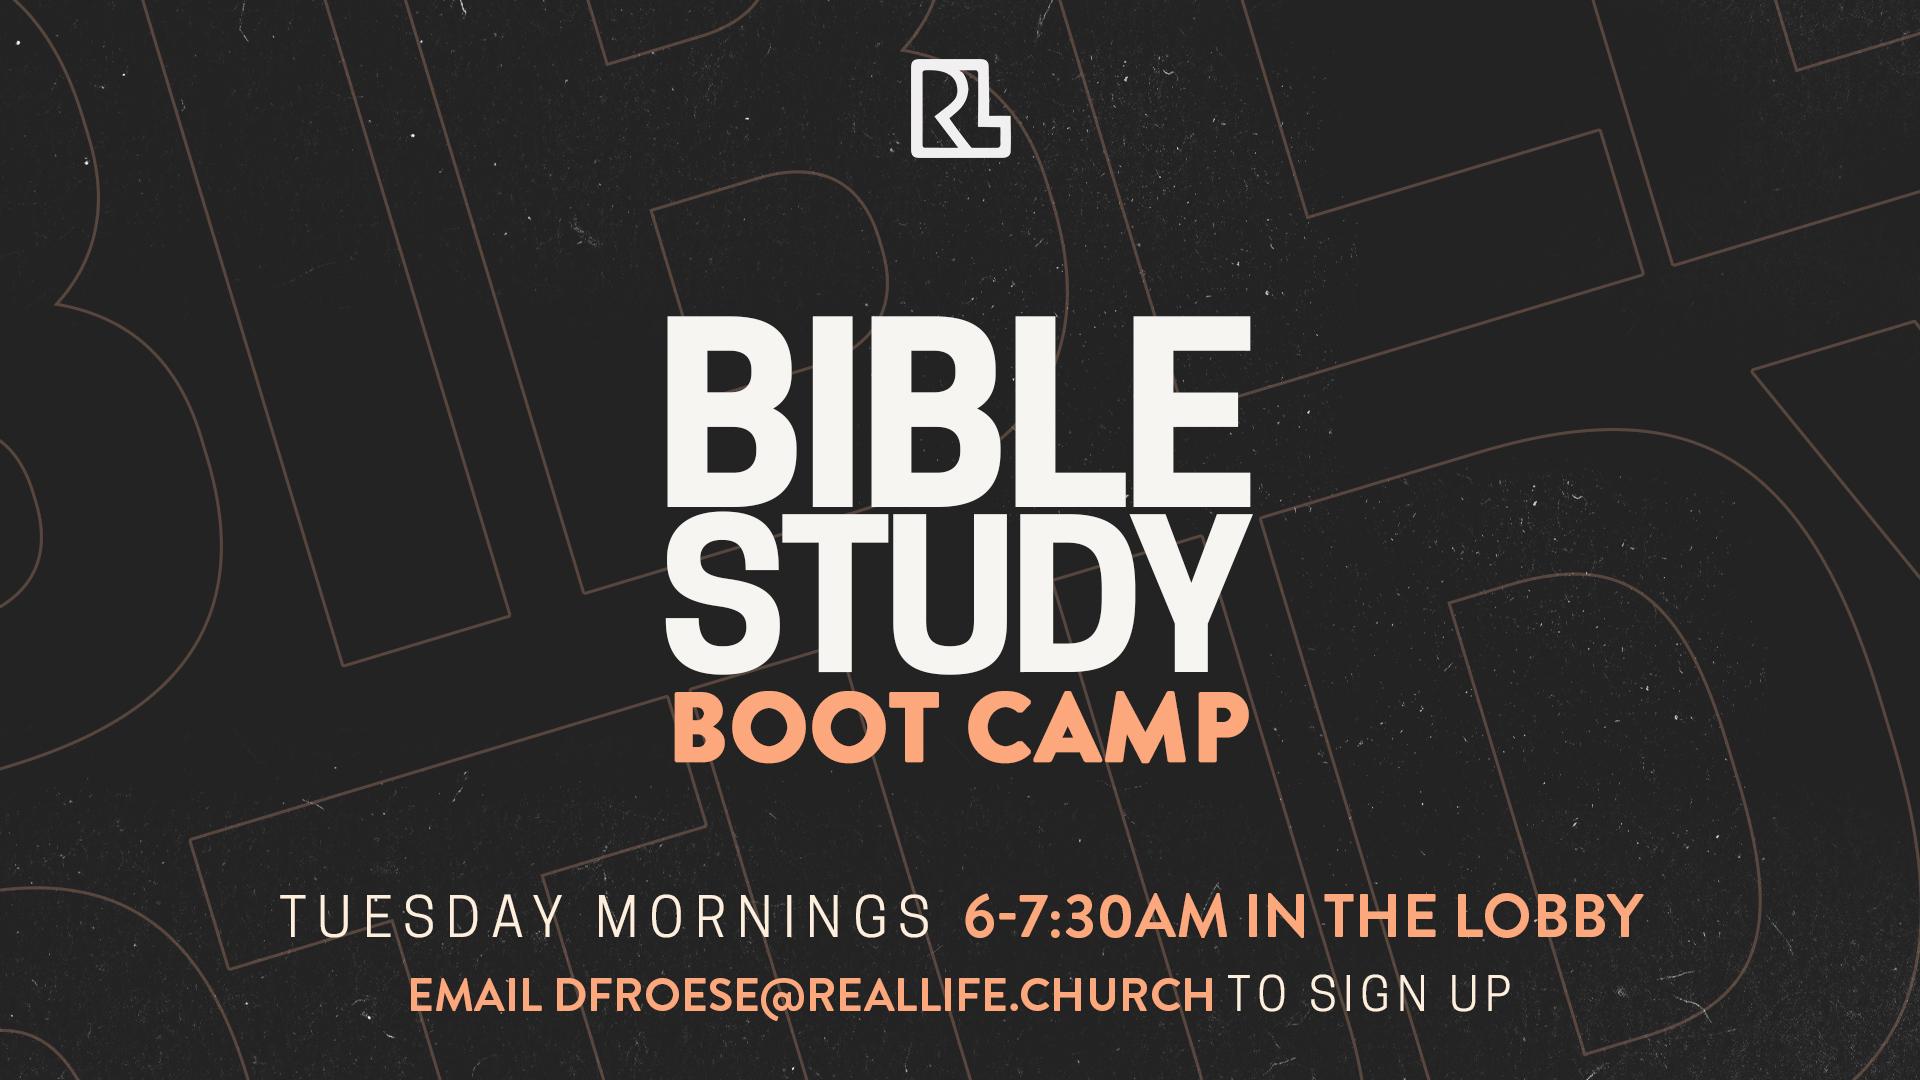 Bible Study Boot Camp